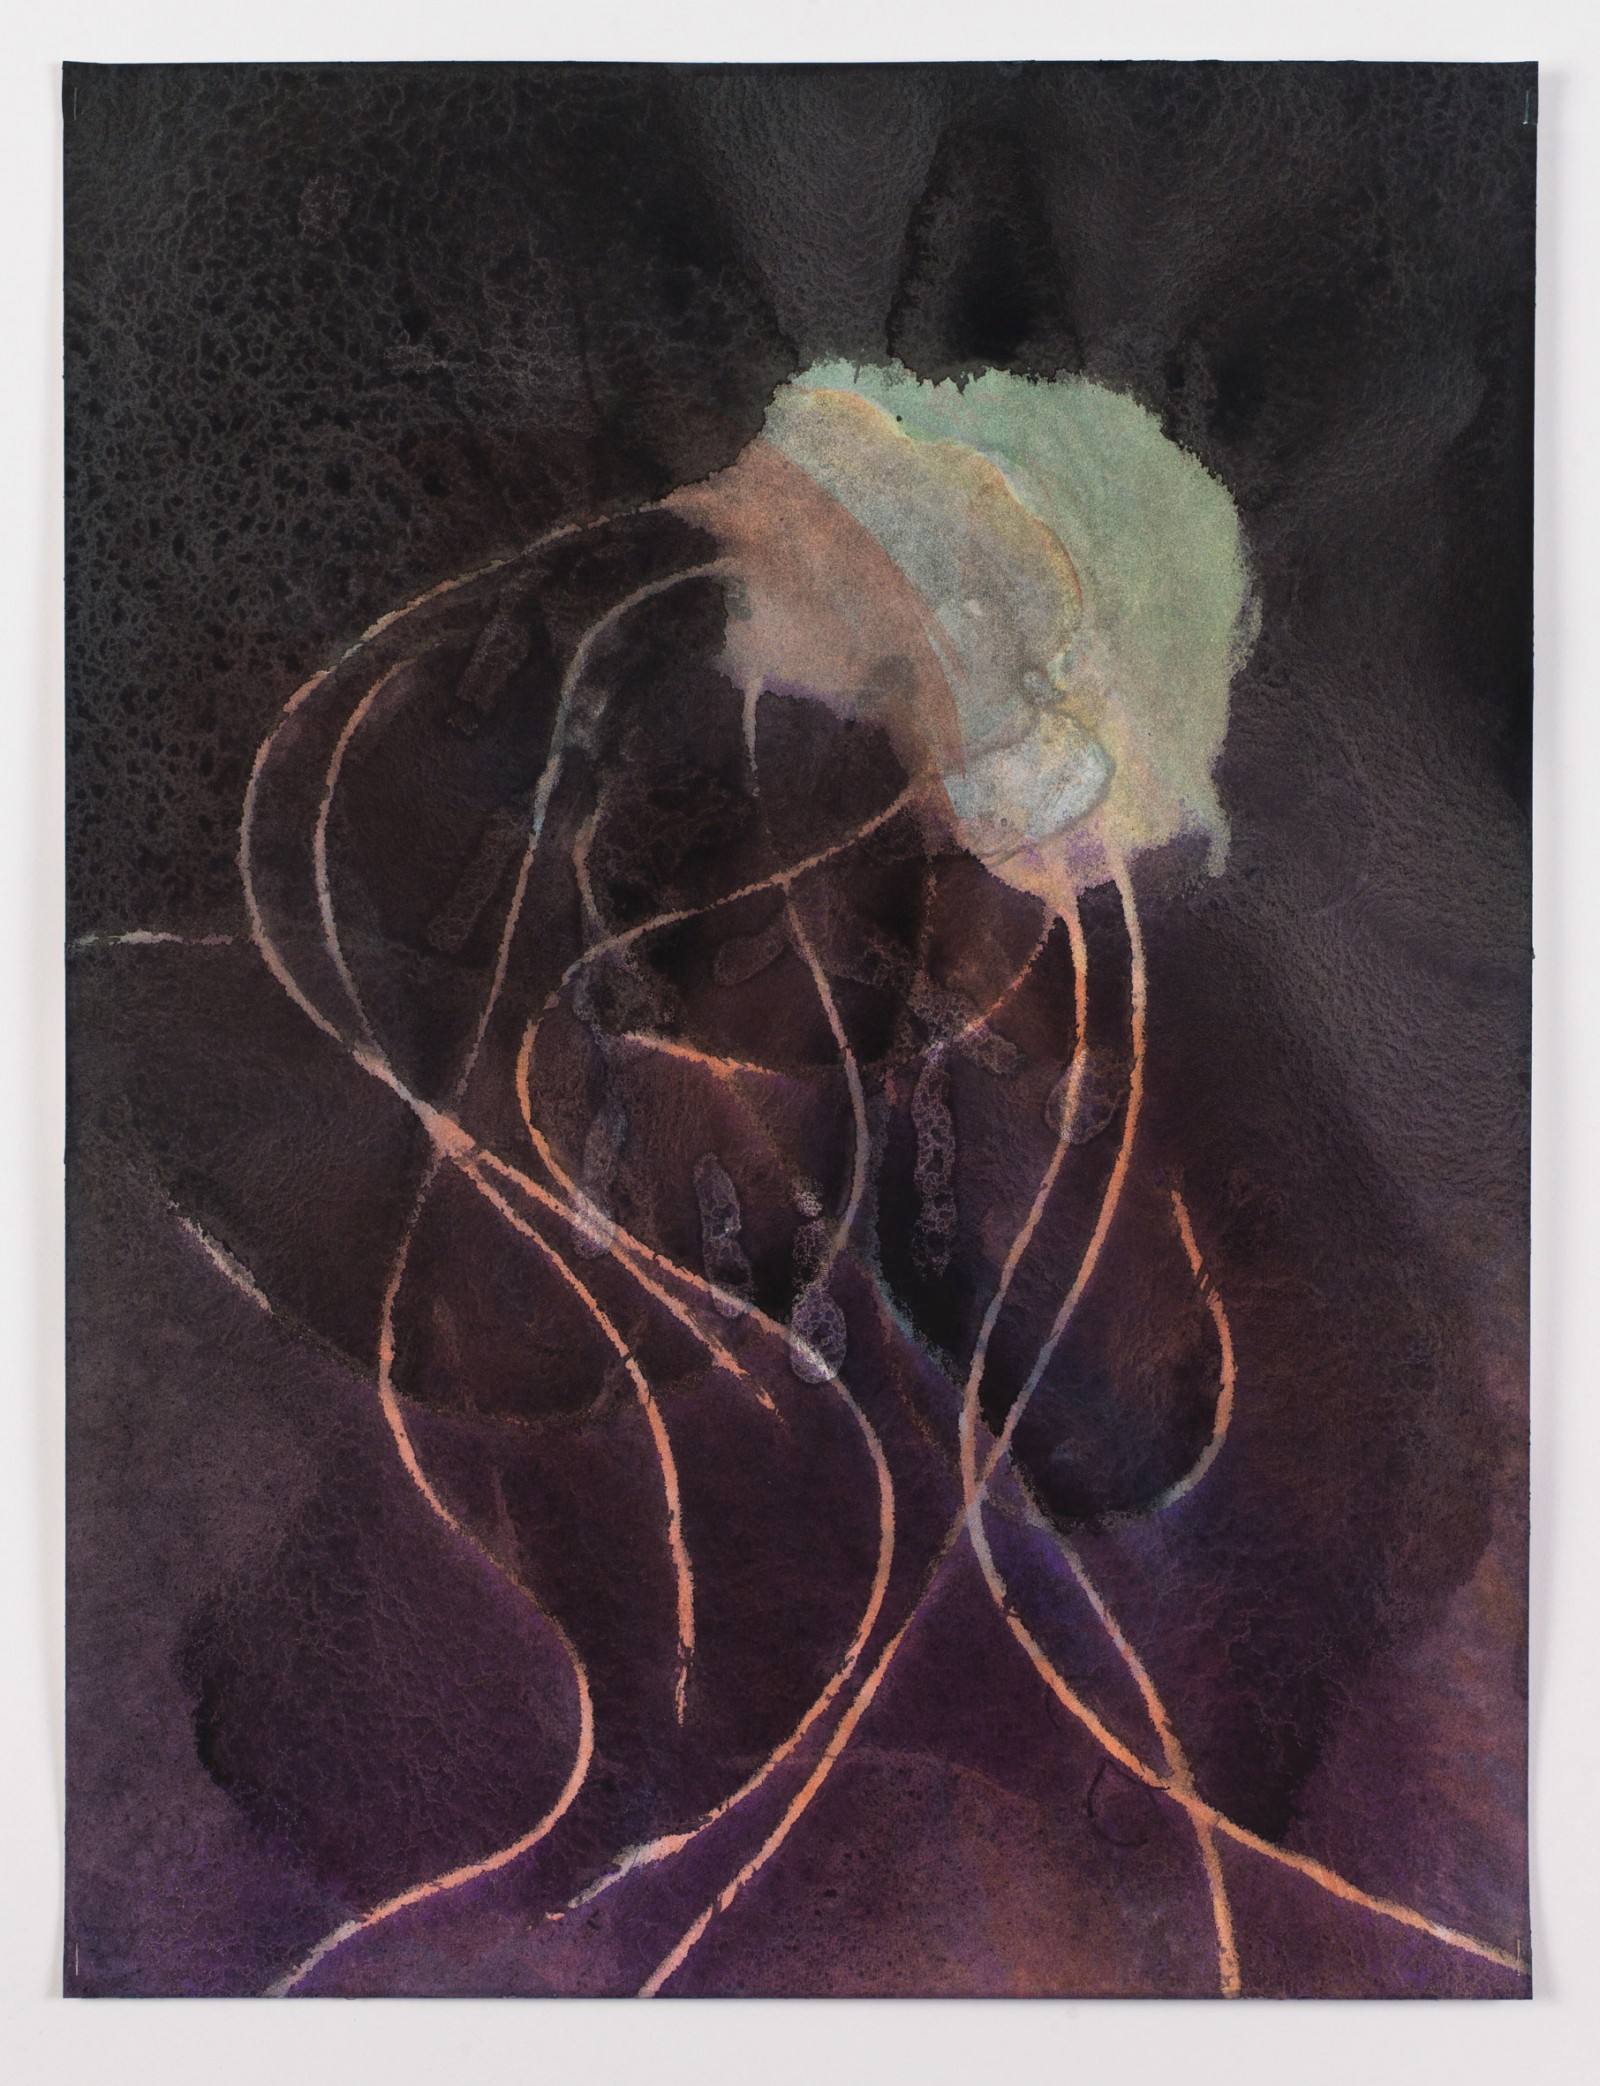 Kim Nekarda: untitled, 2015, body print, watercolour & ink on paper, 61 x 46 cm